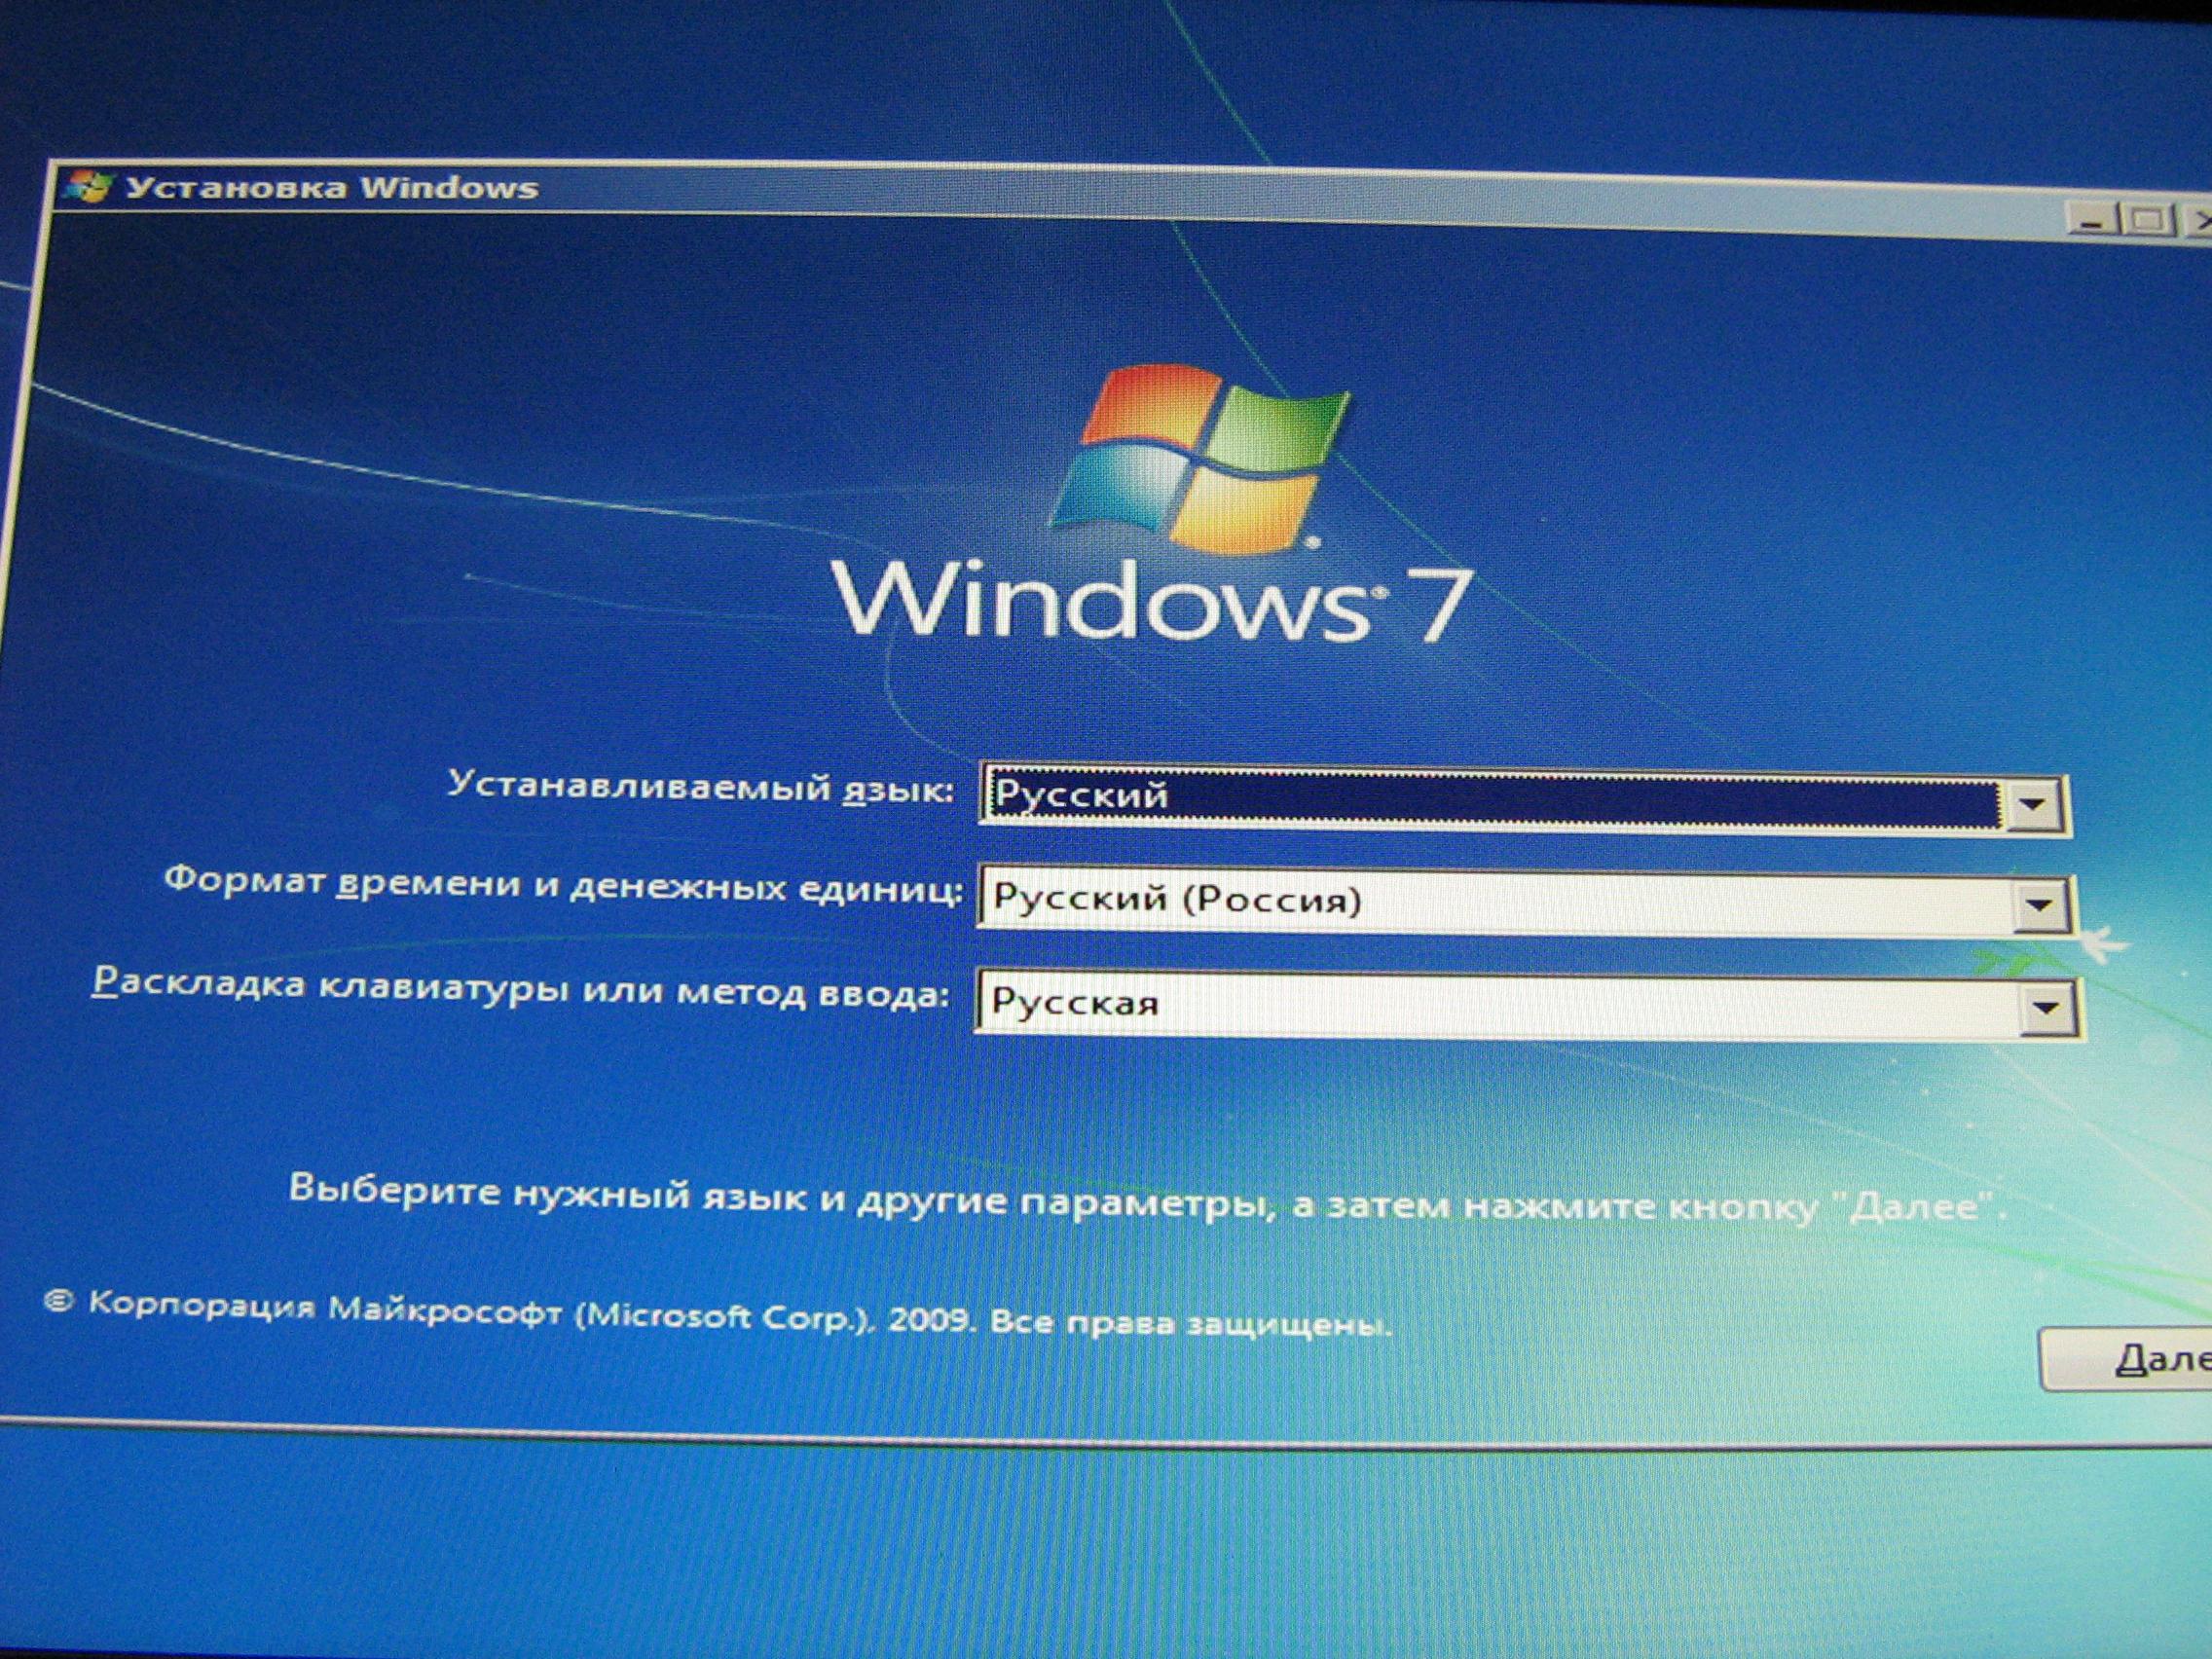 File recovery freeware windows server 2003